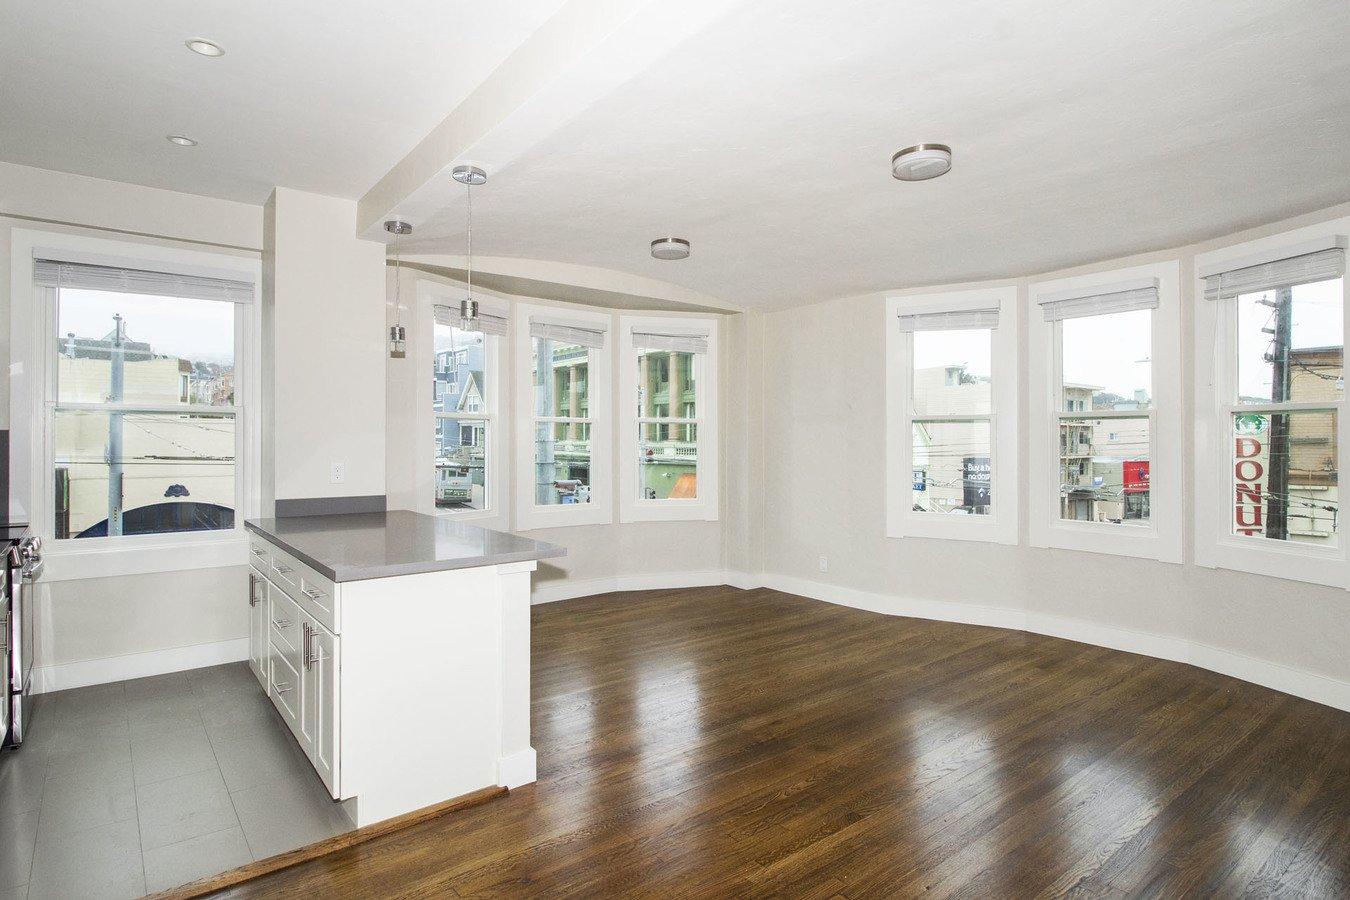 1 Bedroom 1 Bathroom Apartment for rent at 350 Judah Apartments in San Francisco, CA